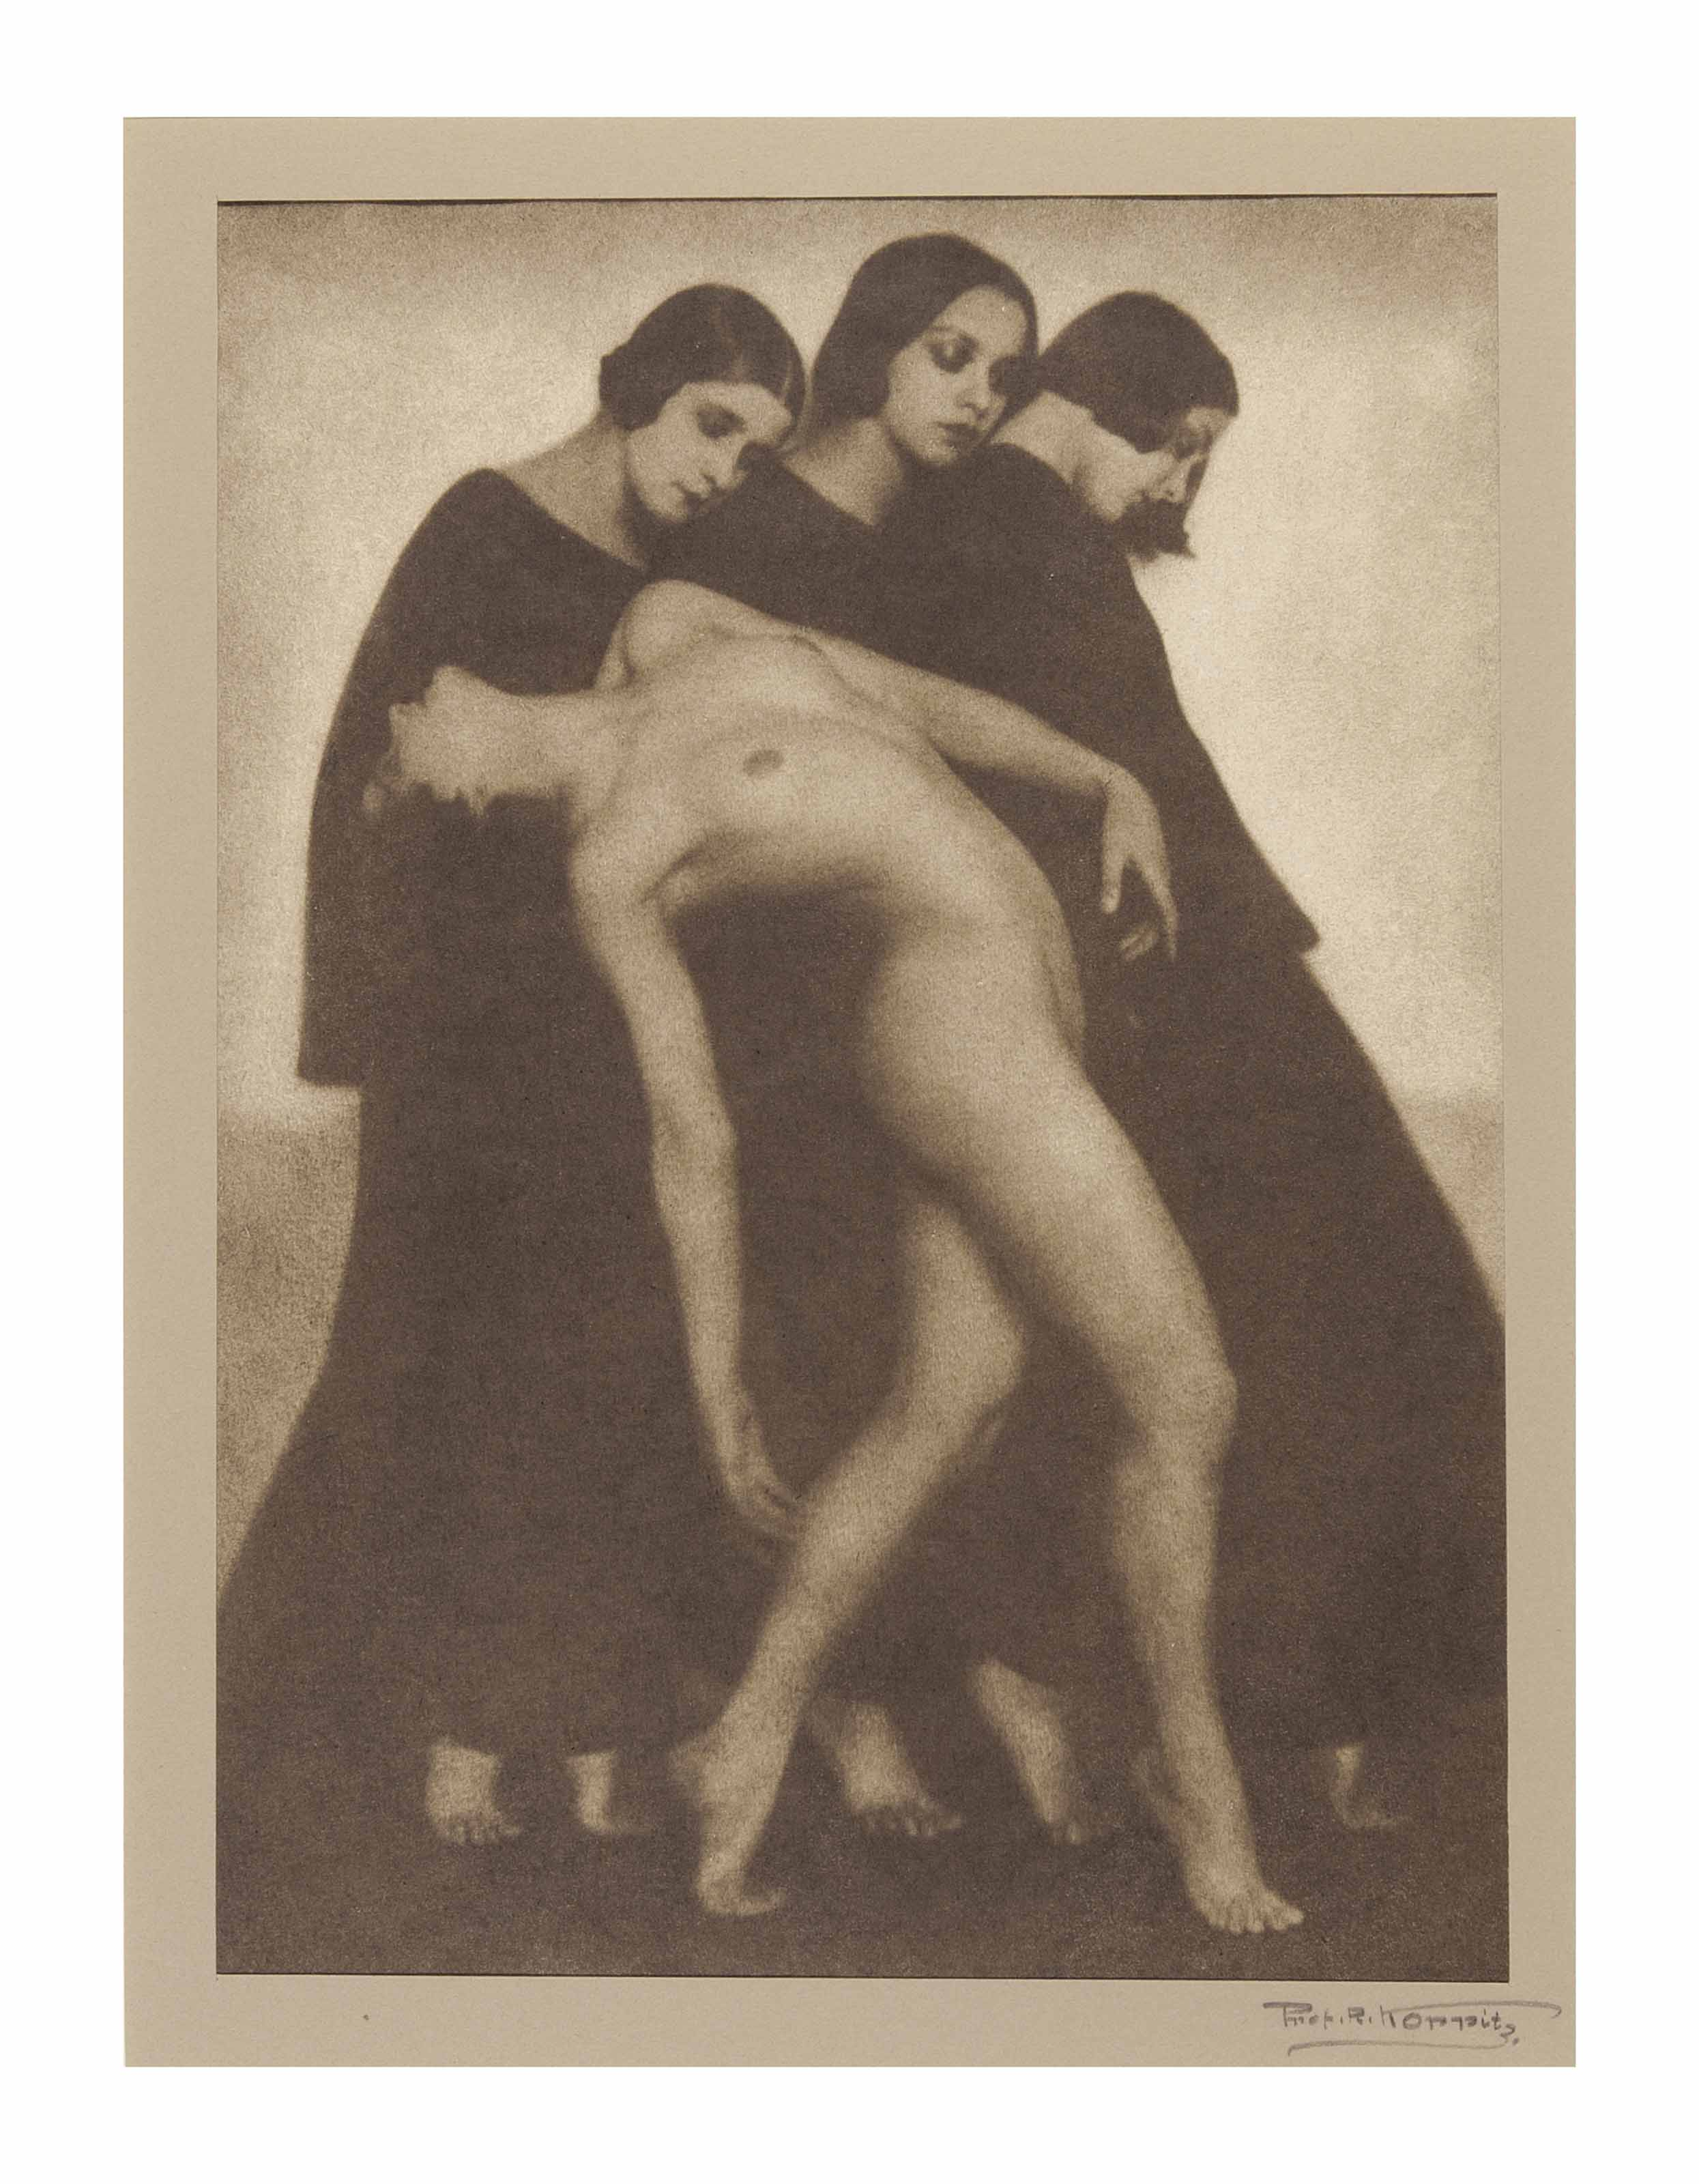 Bewegungsstudie (Movement Study), 1925